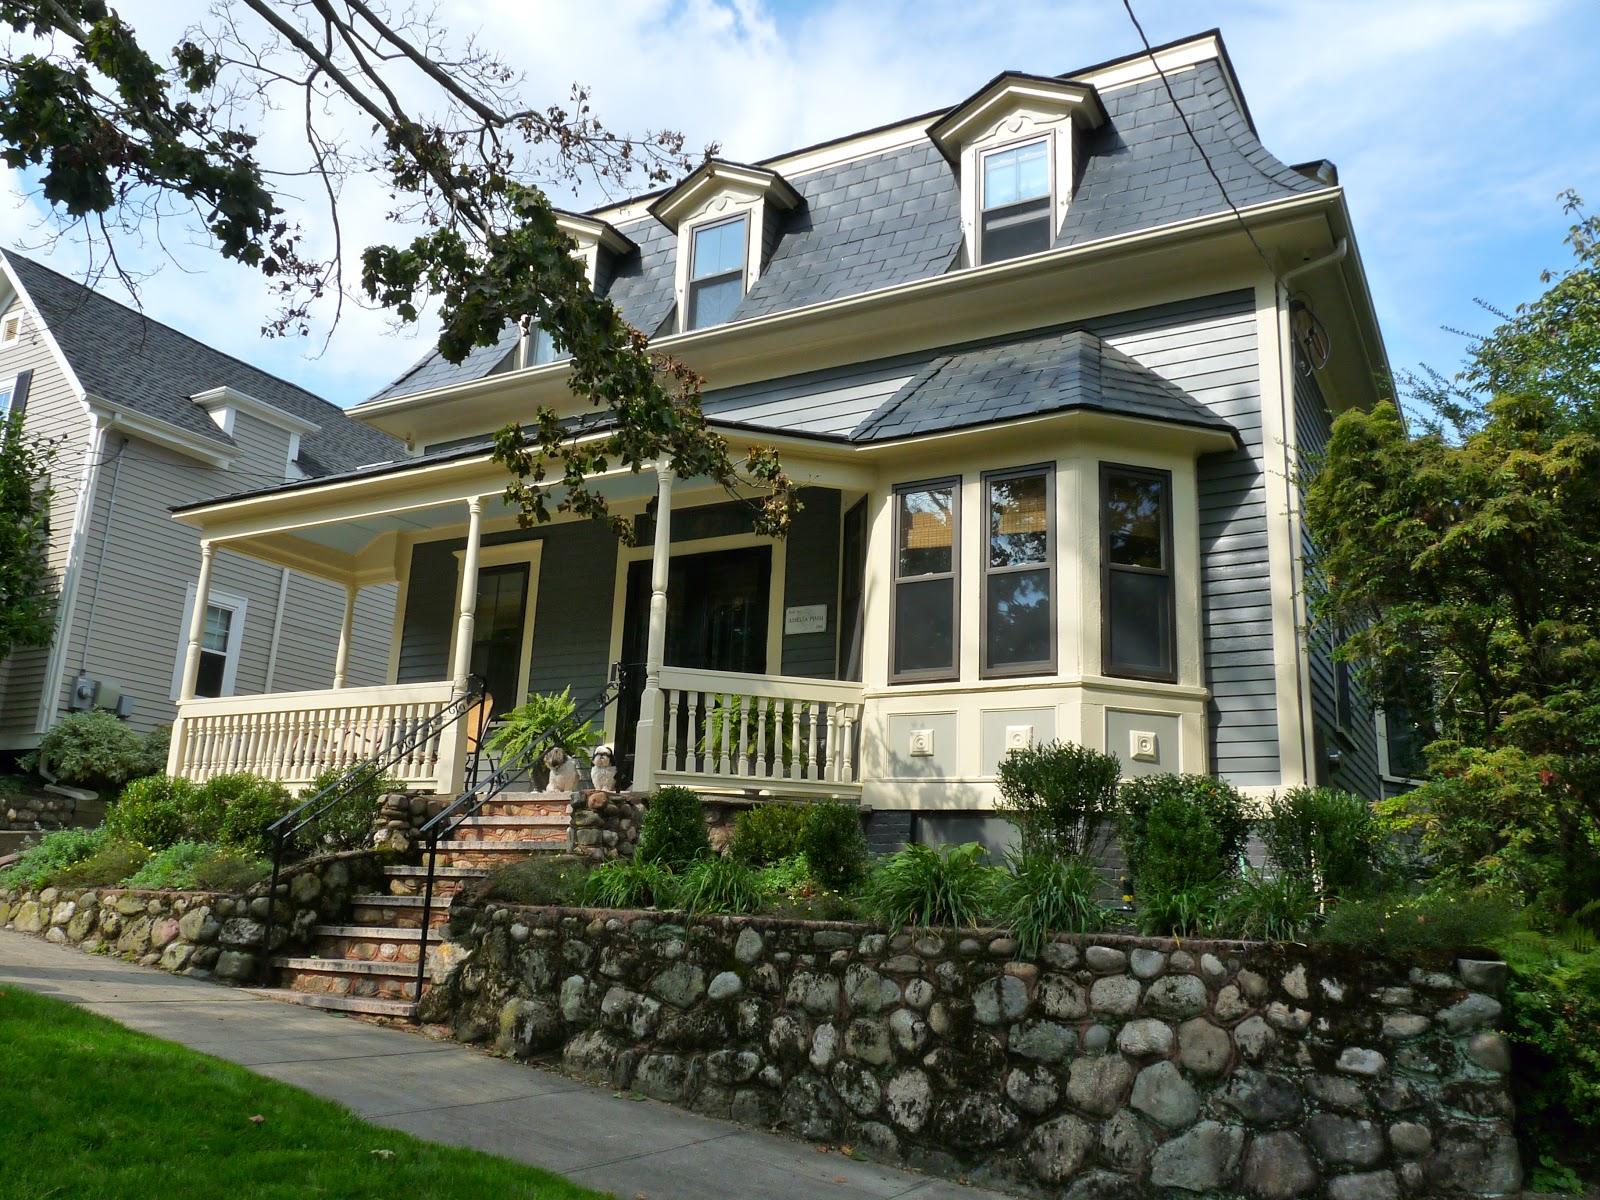 Hazardous Design Our New Old House Exterior Revealed